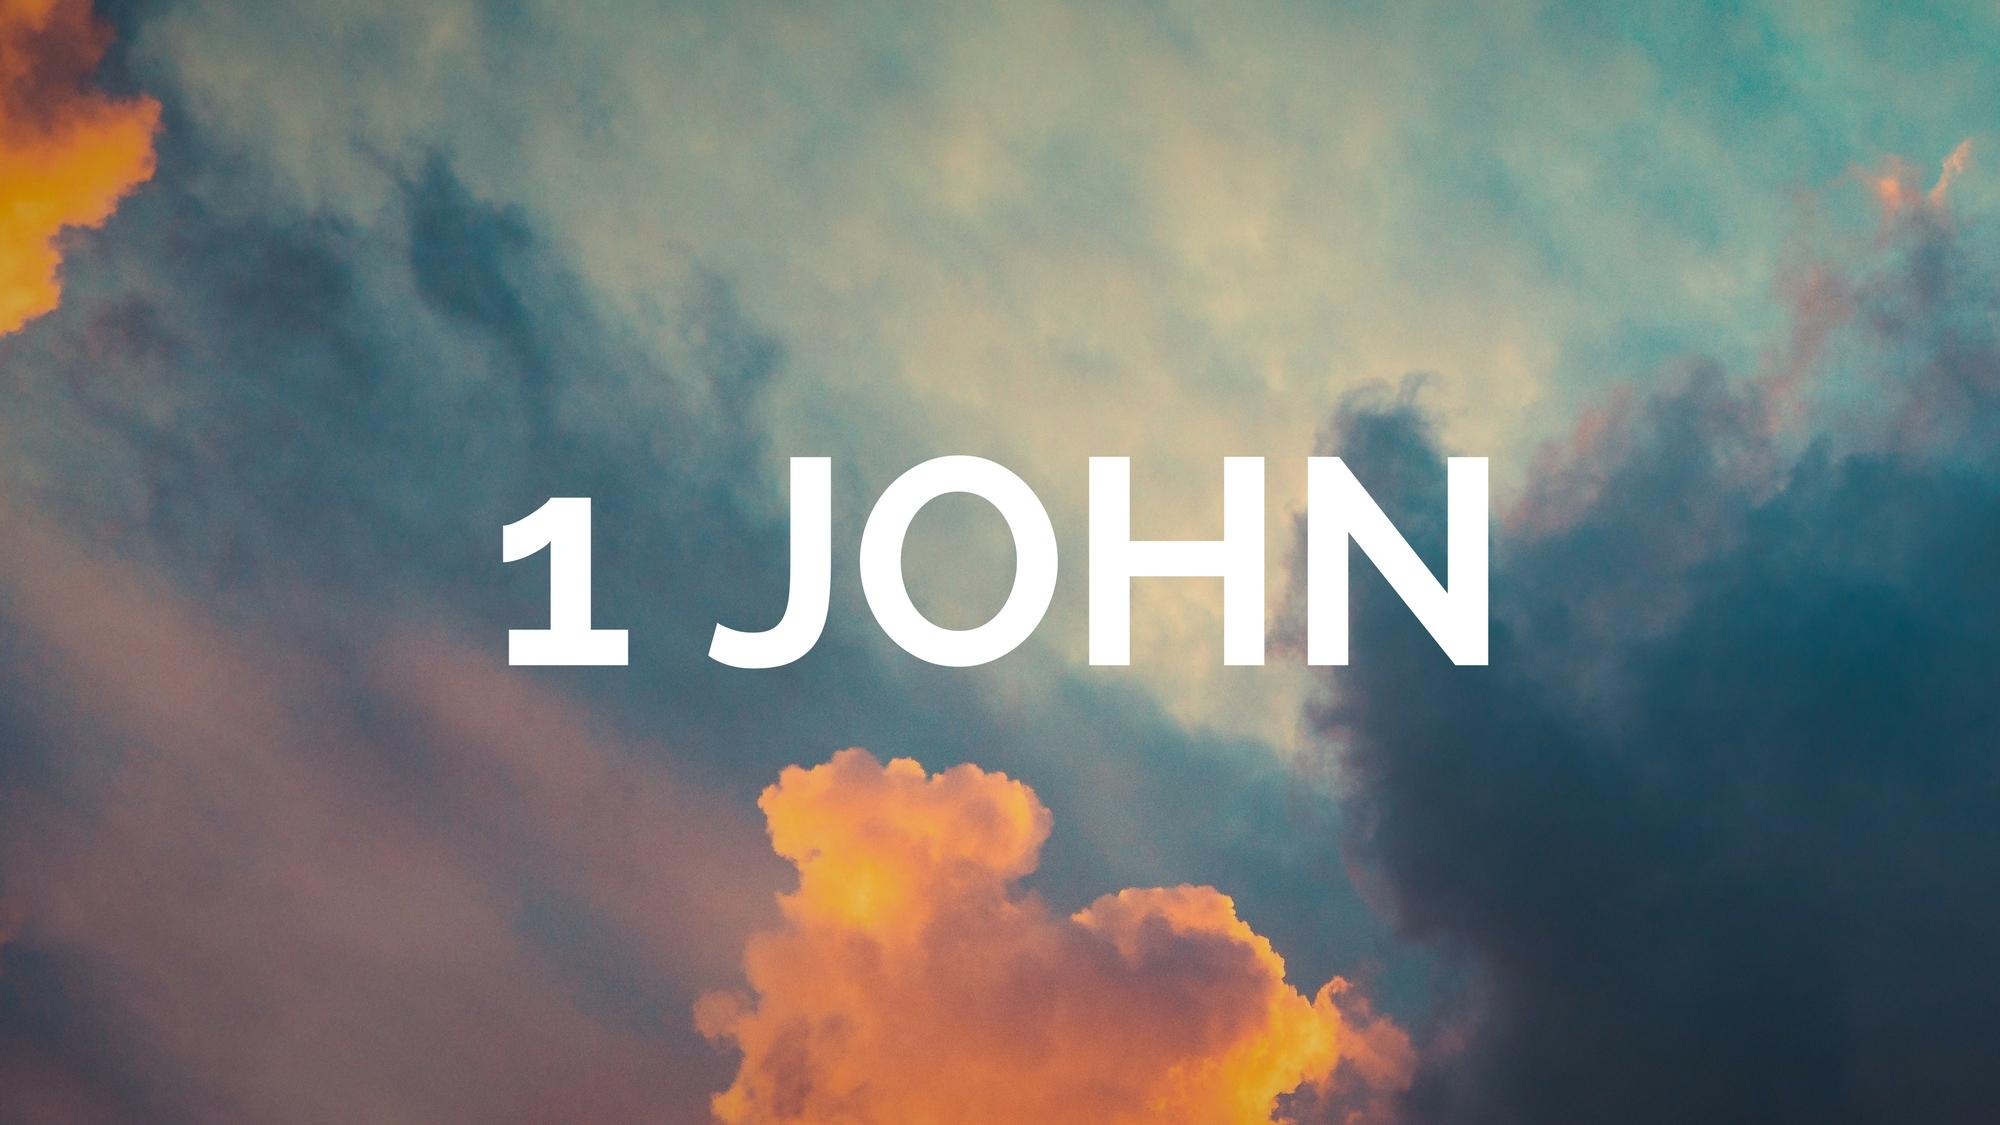 A Loving Call to Right Living (1 John 3:4-10)